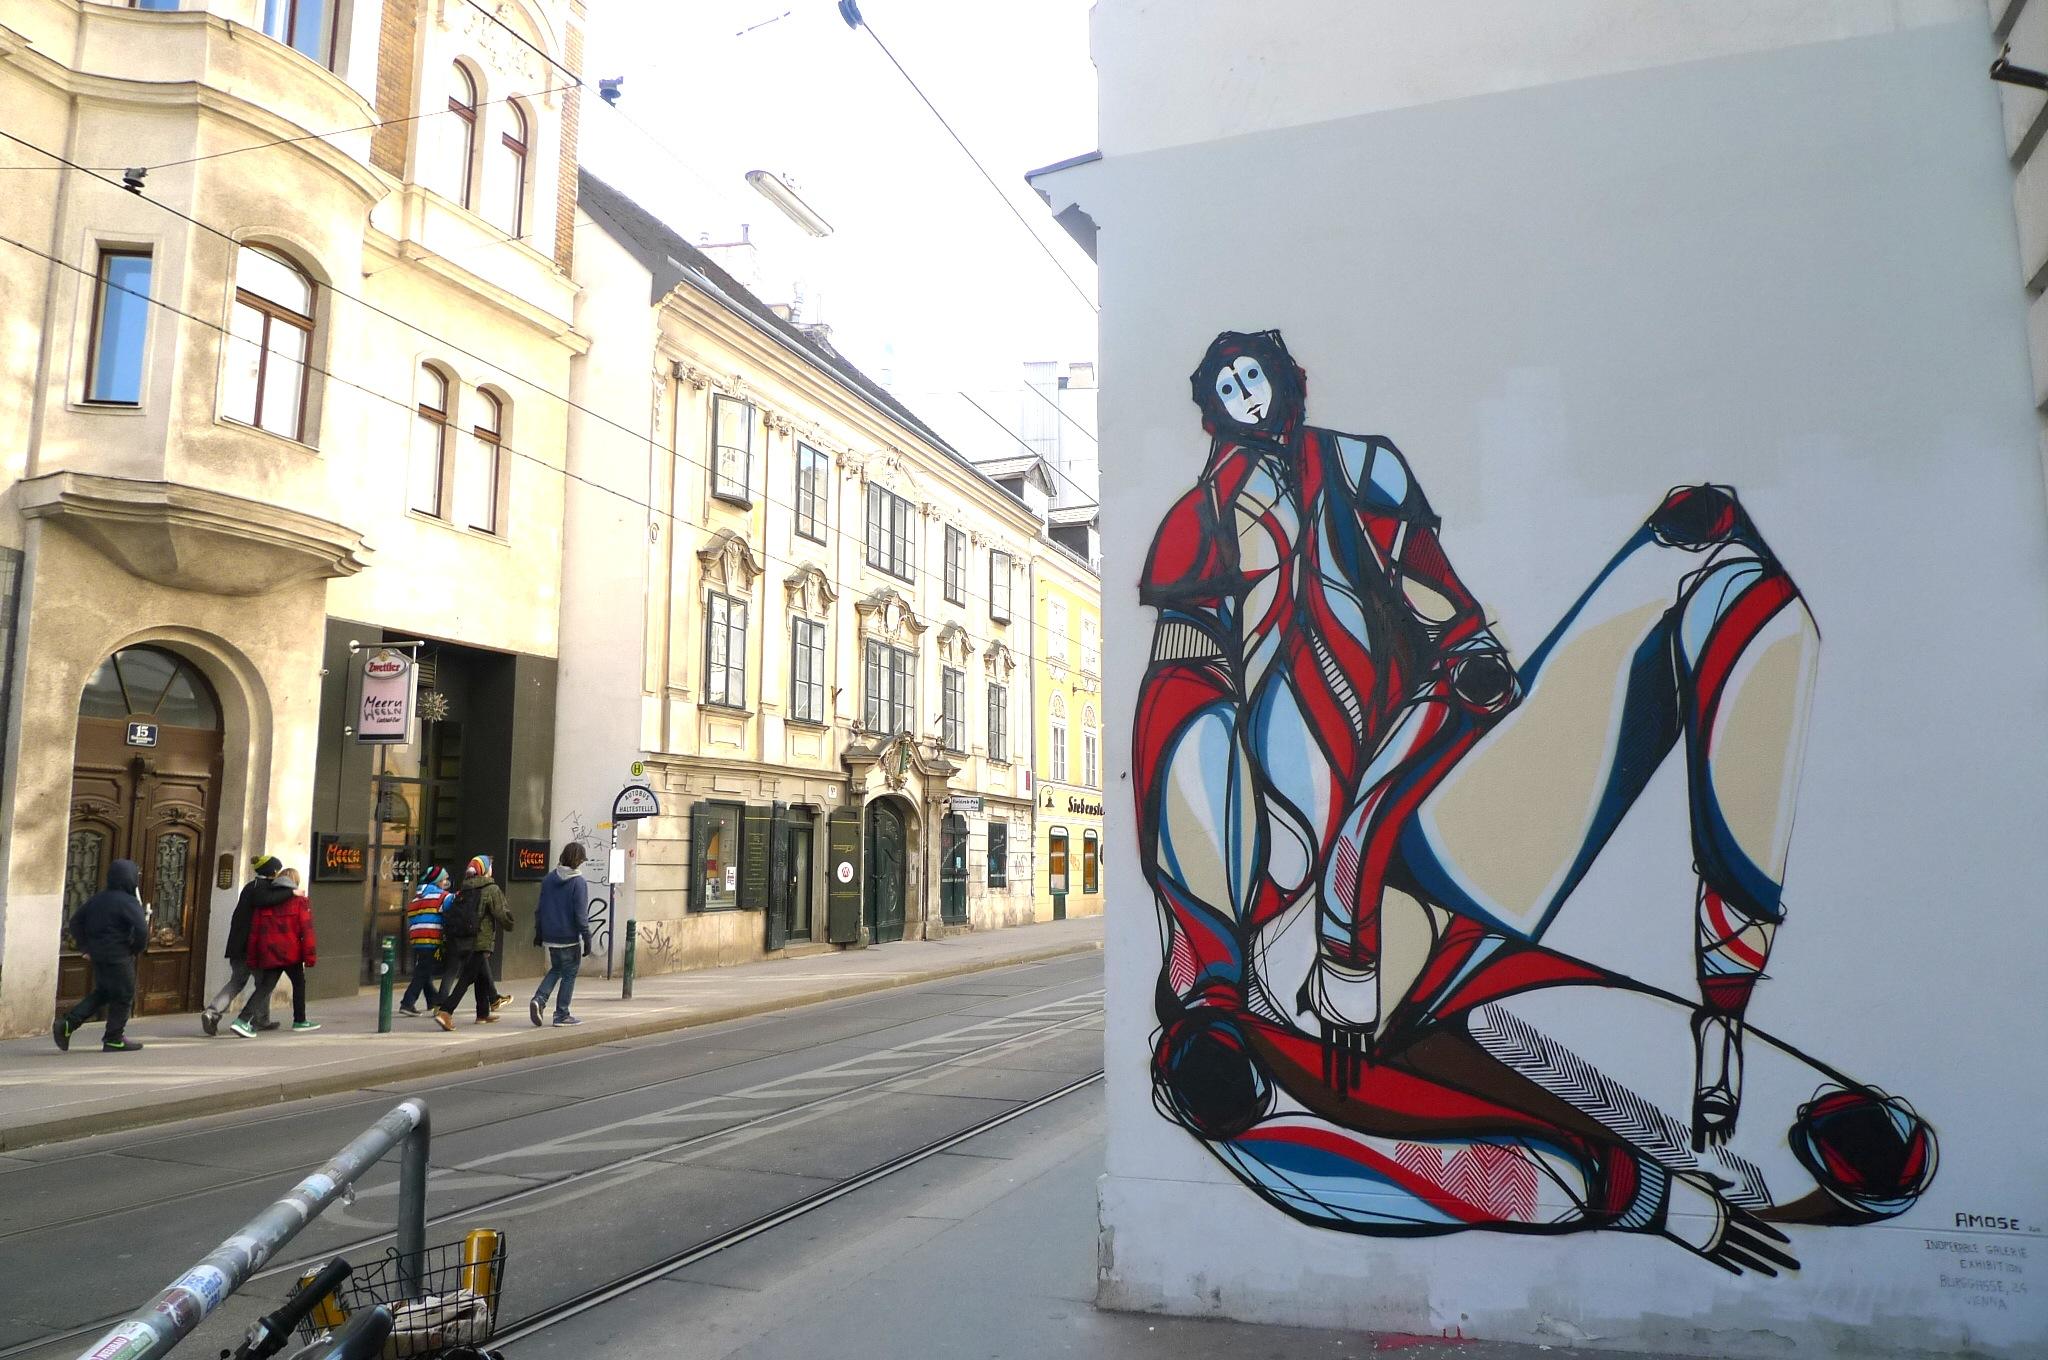 AMOSE Siebensterngasse, Vienna